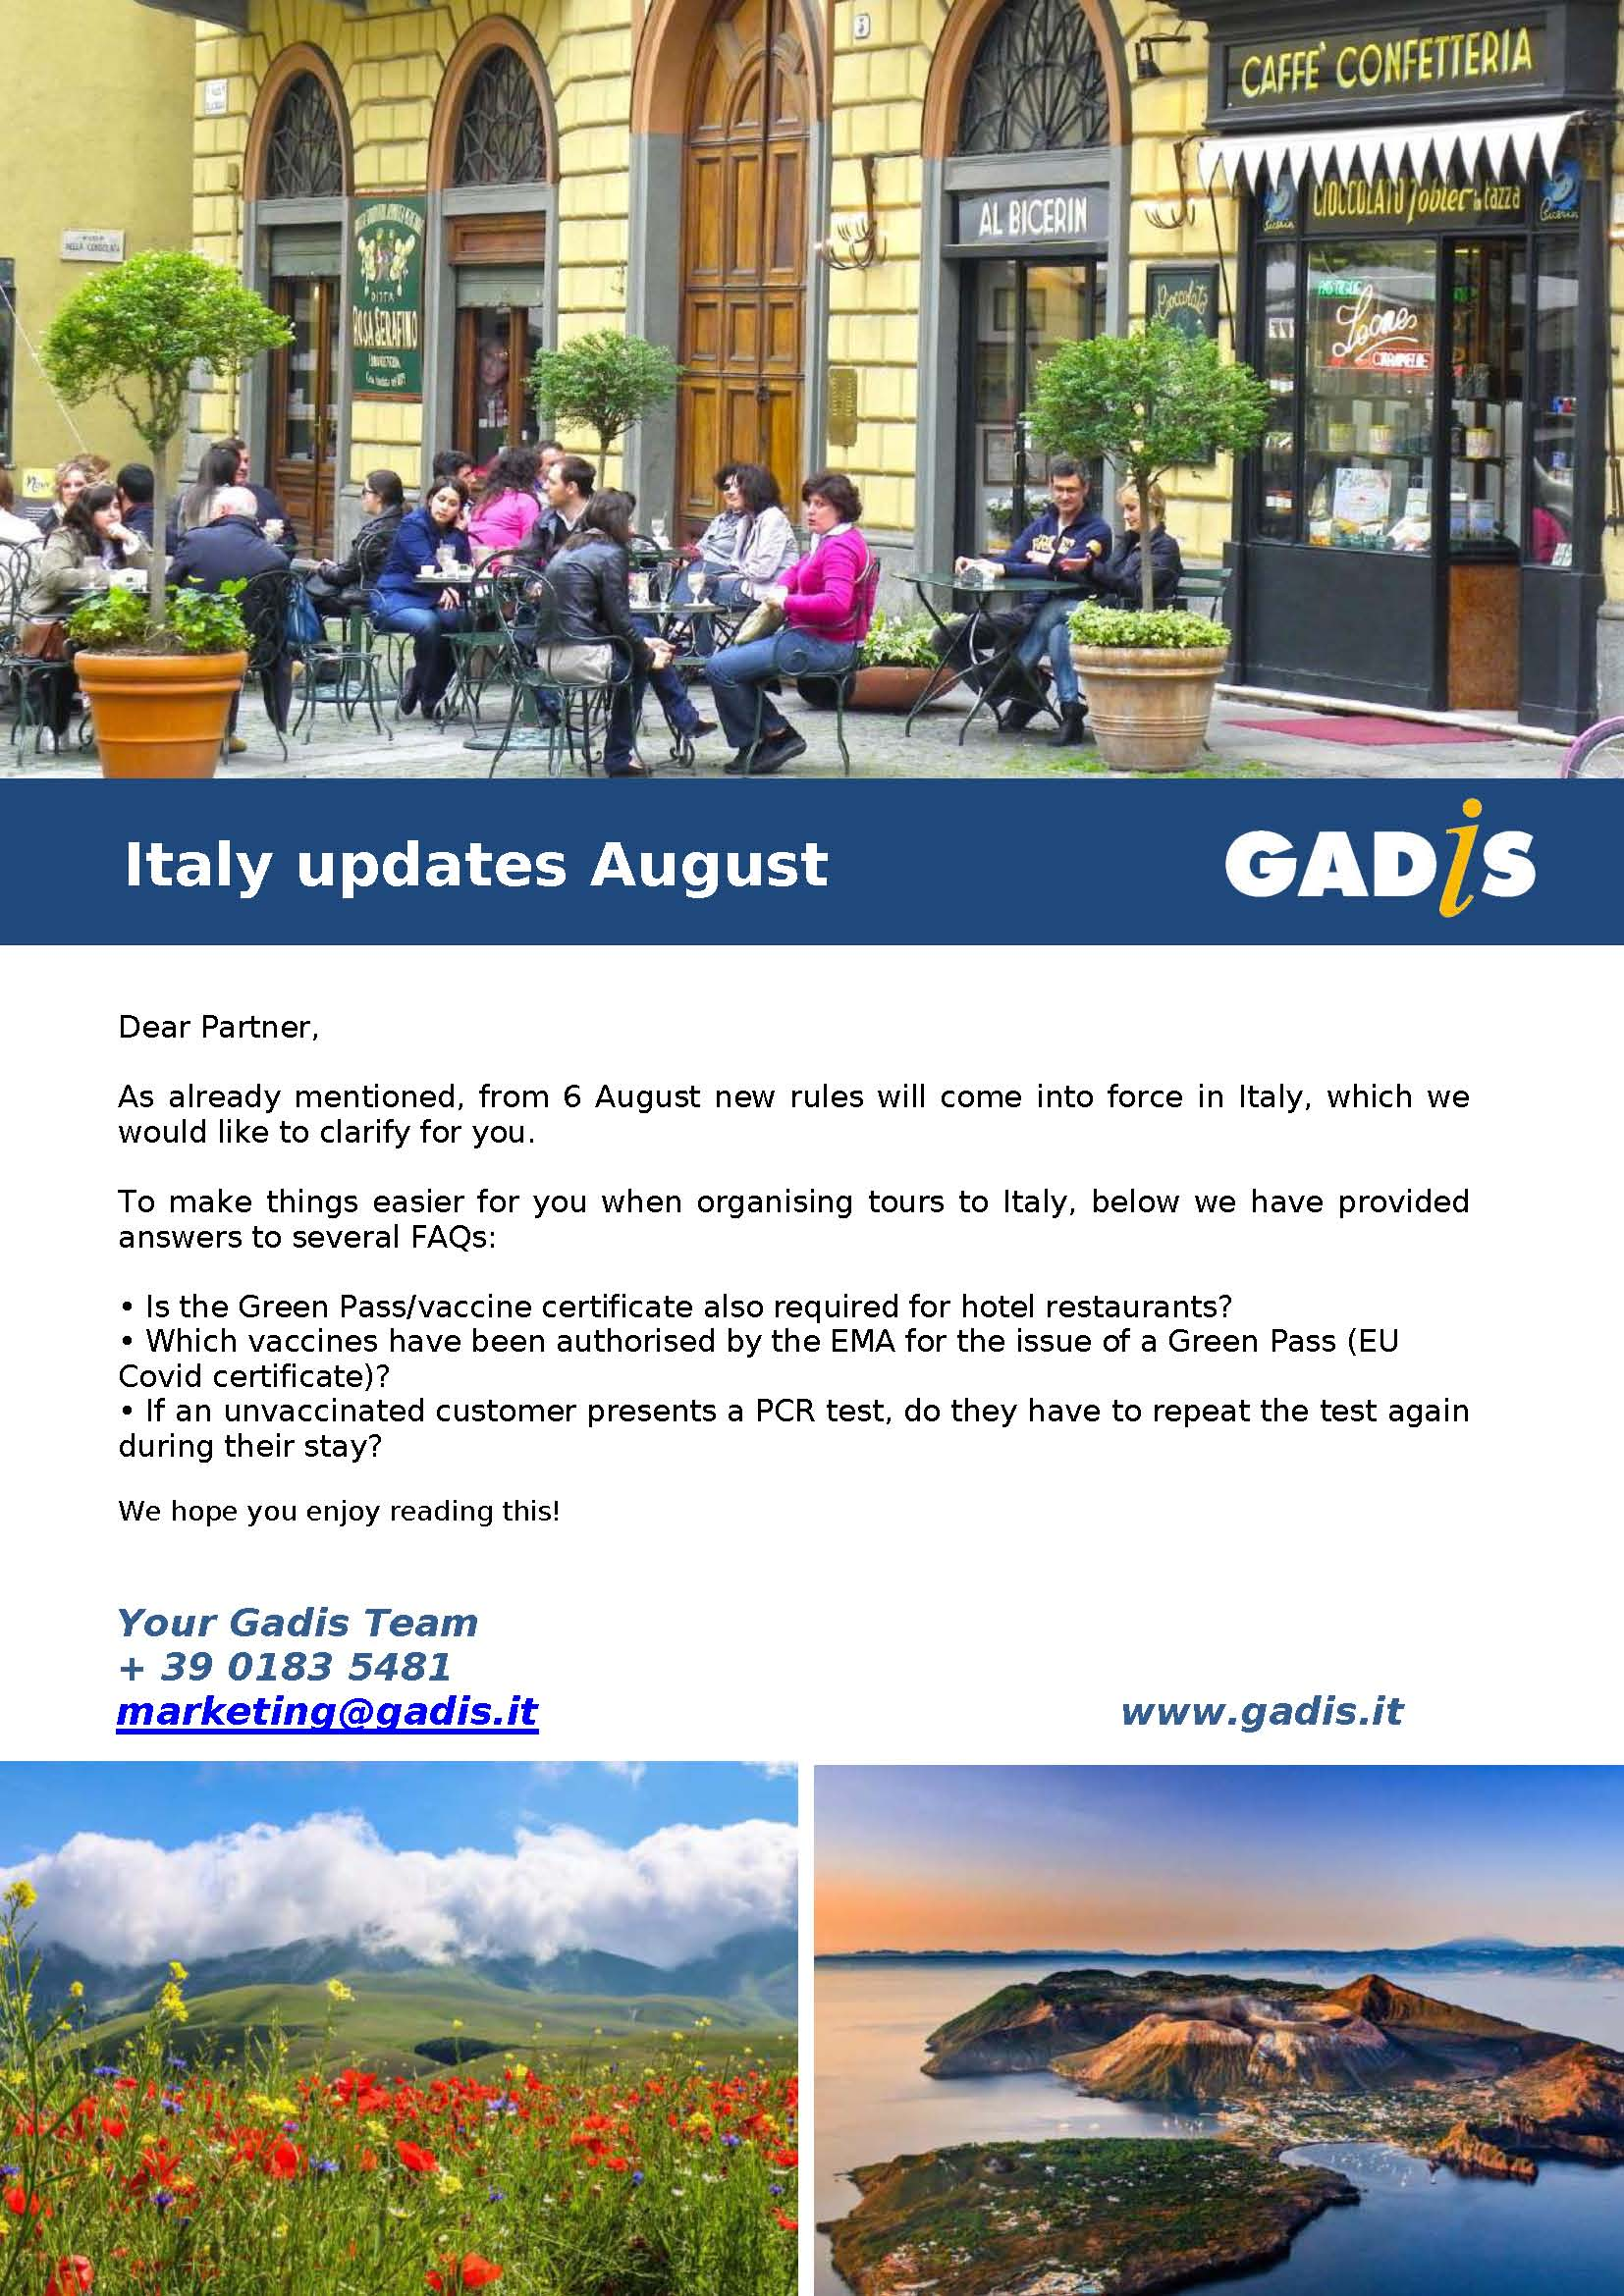 Italy updates August 2021